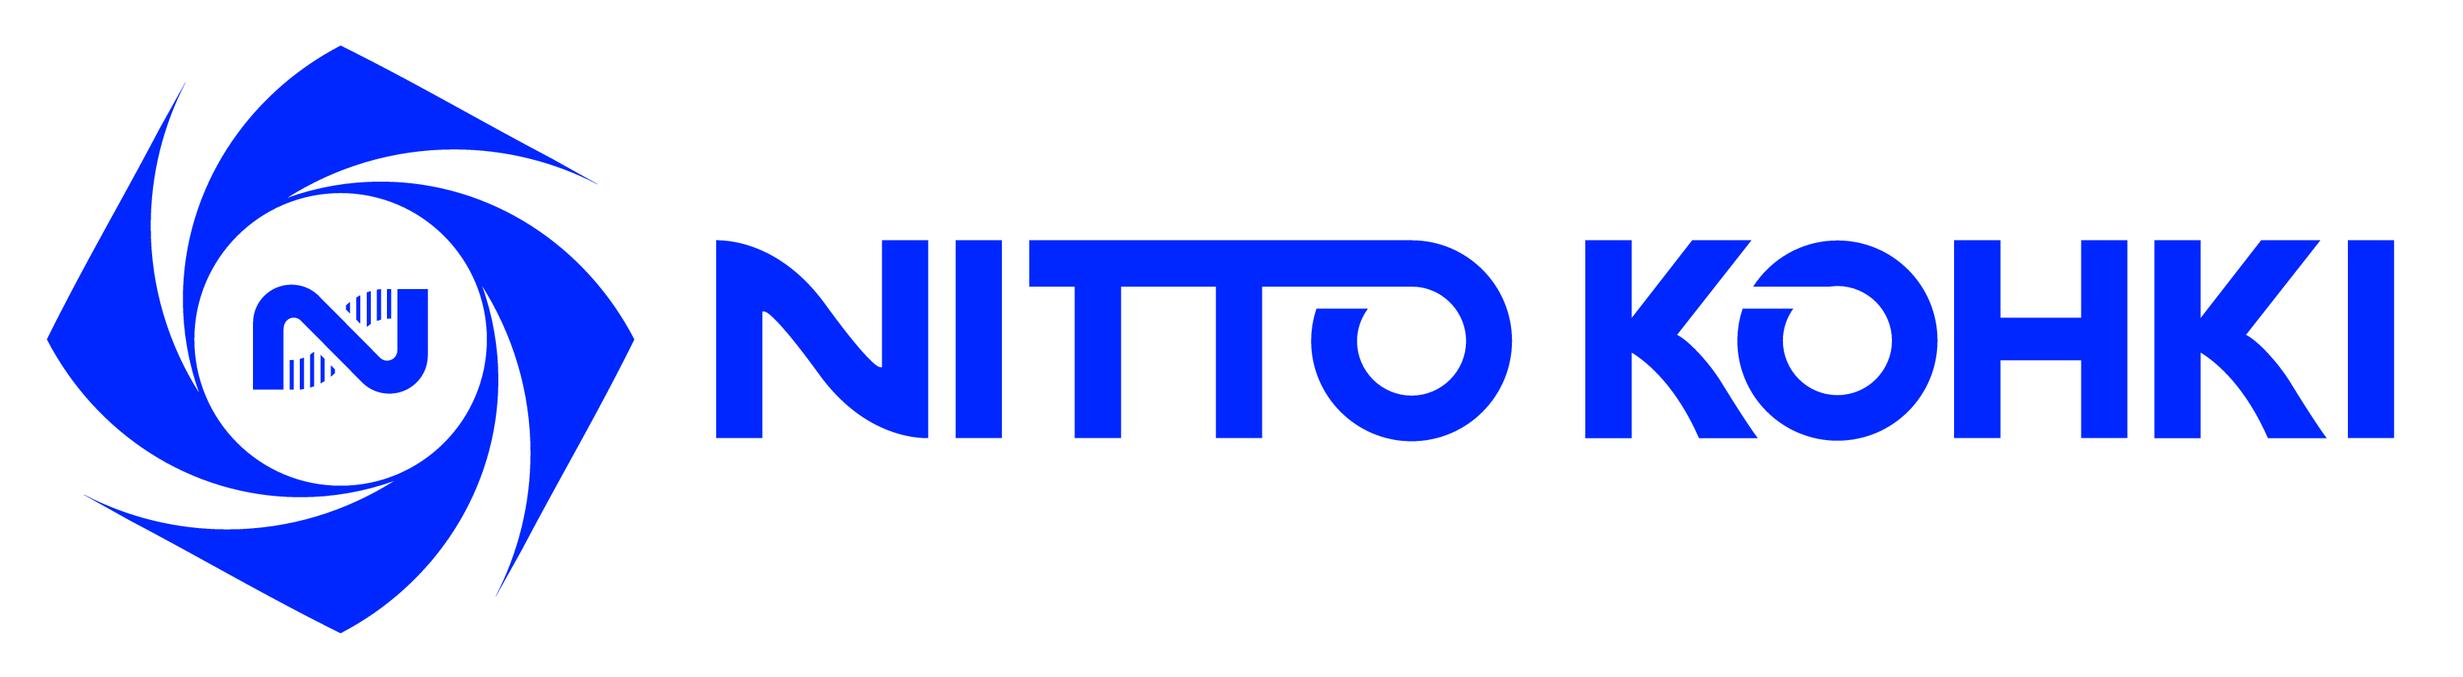 NITTO_KOHKI_USA_MEDO_Logo_2014.12.png